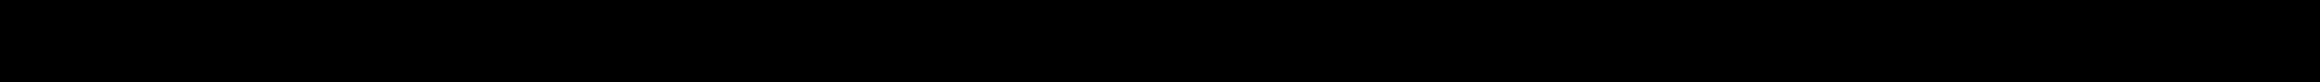 AIRTEX 1201-H7, 1201-J6, 1610278080, 1610278080, 9684319880 Wasserpumpe